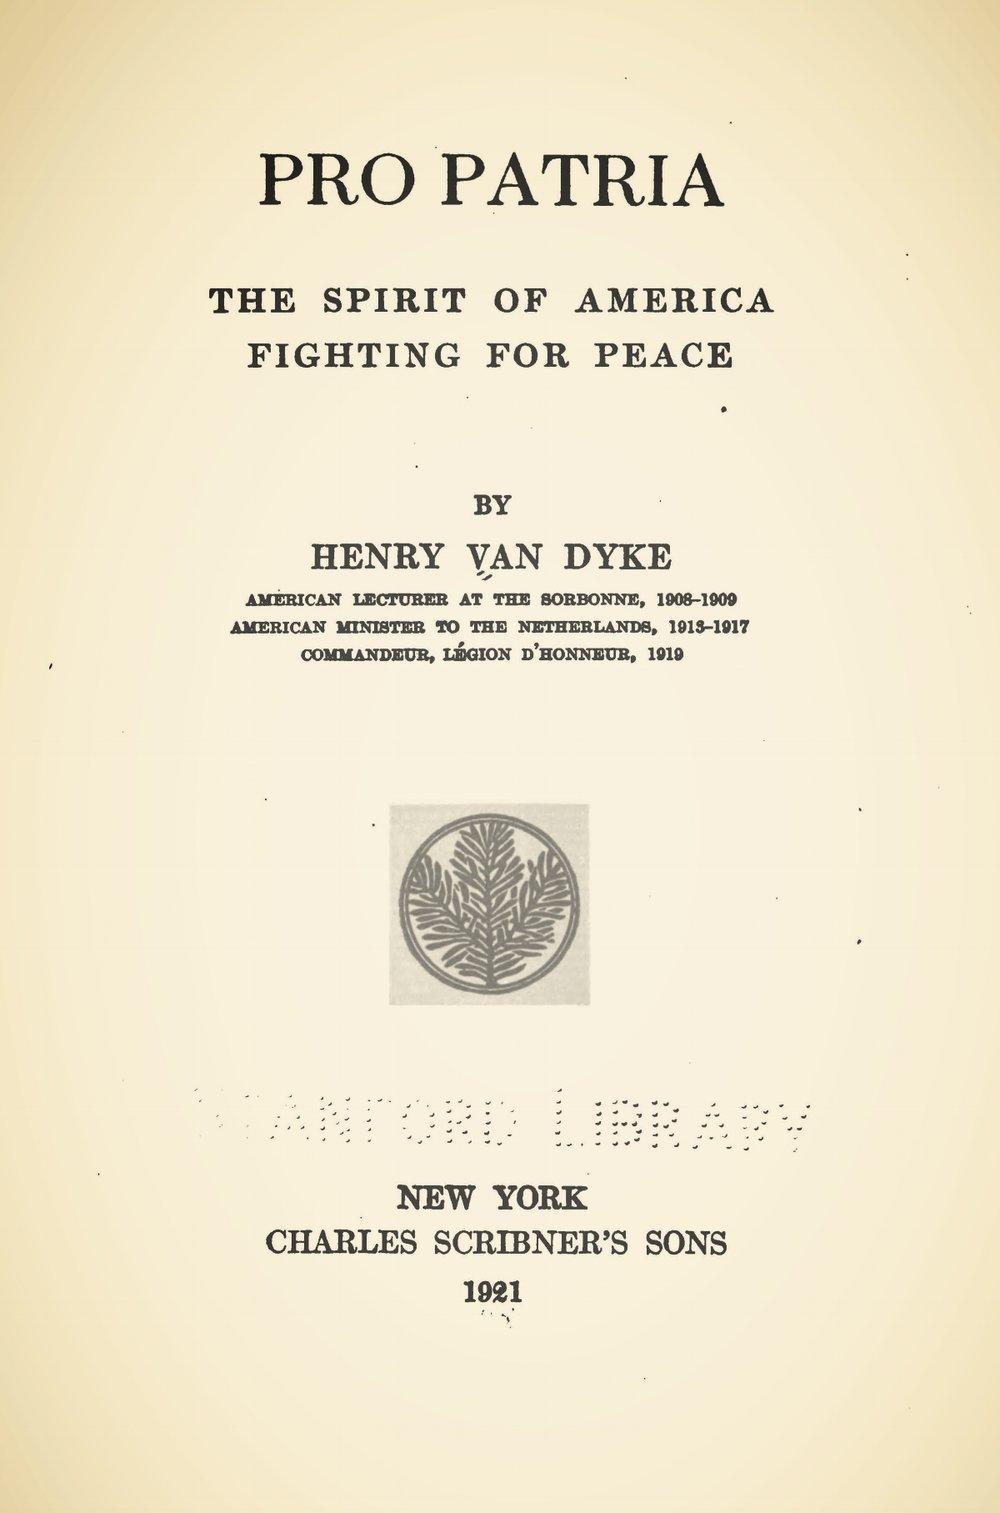 Van Dyke, Jr., Henry Jackson, Pro Patria Title Page.jpg